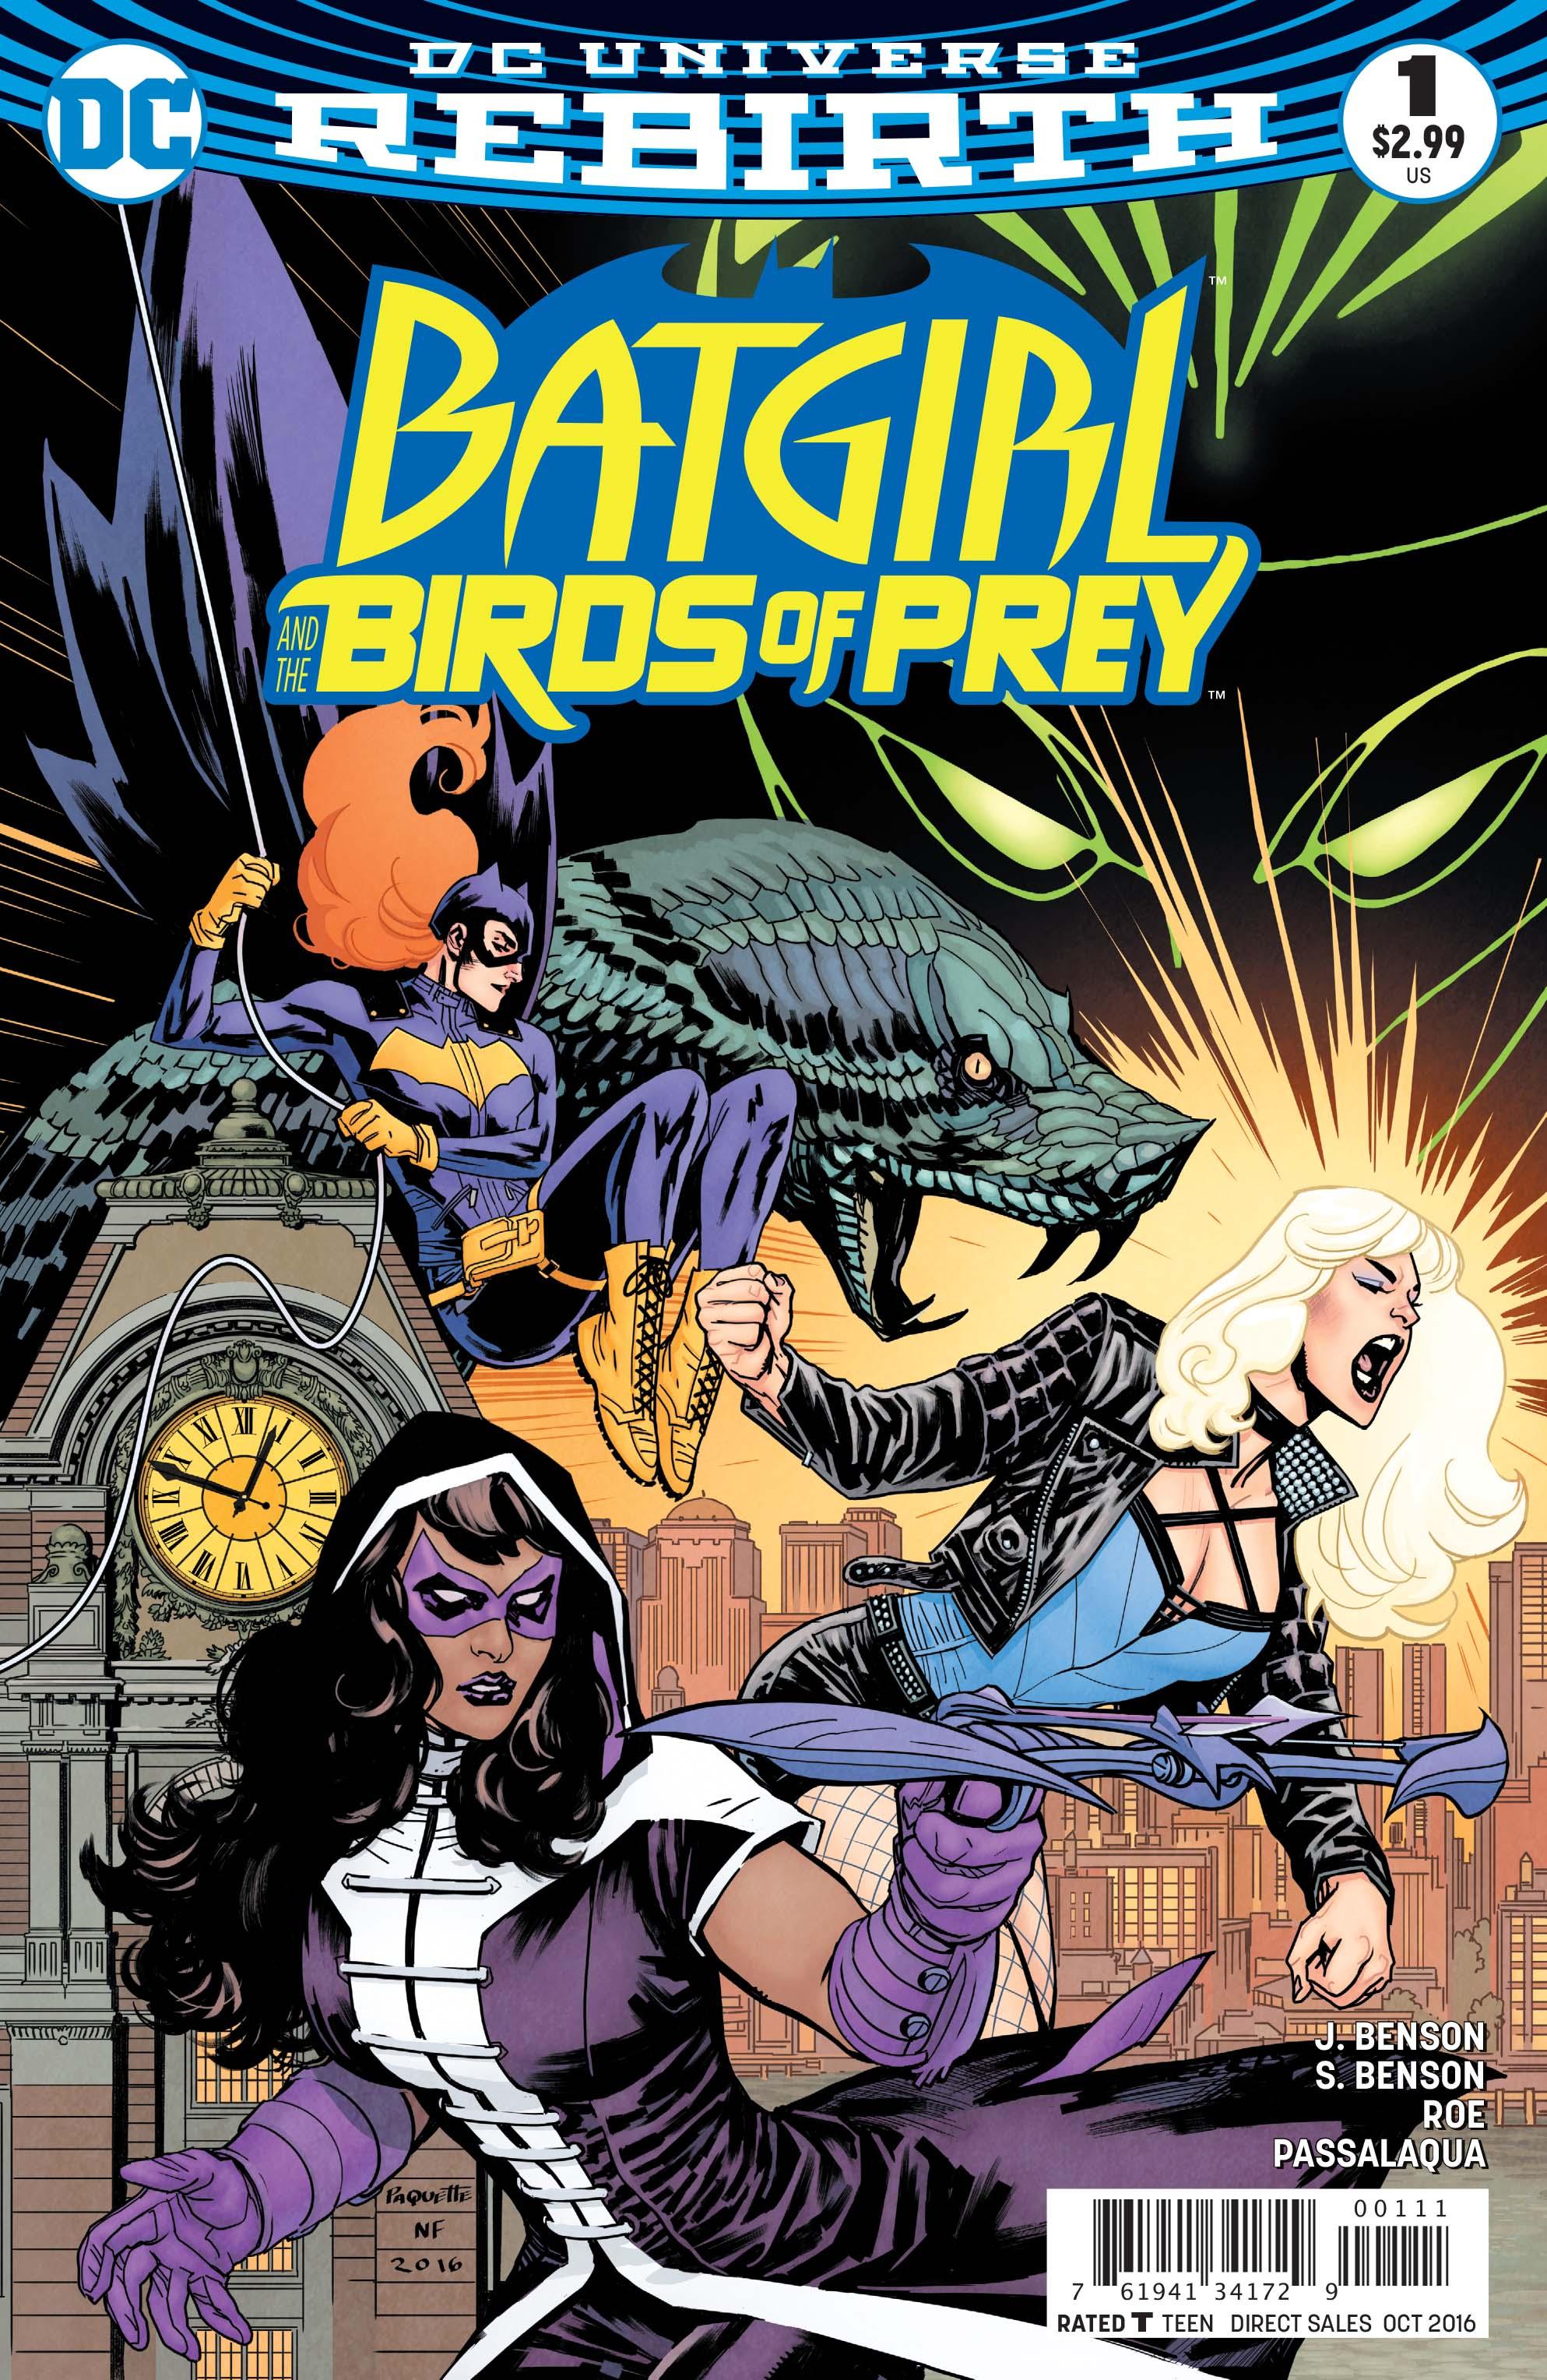 REBIRTH COMIC BATGIRL #4 DC 2016 1st Print